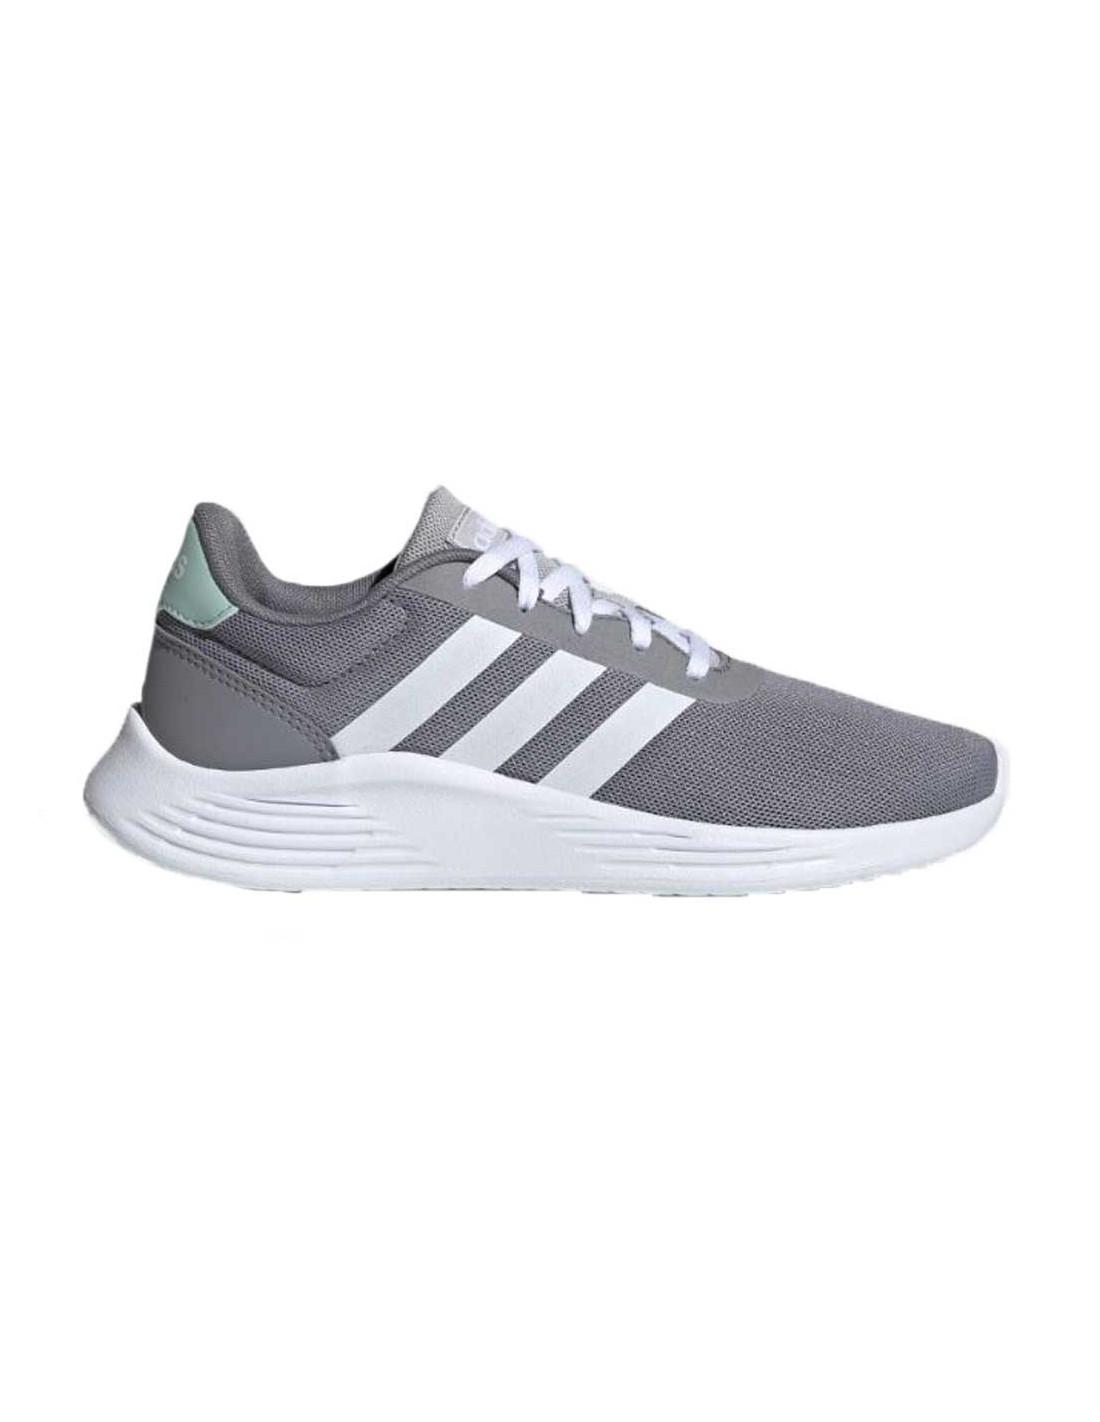 adidas grigio chiaro